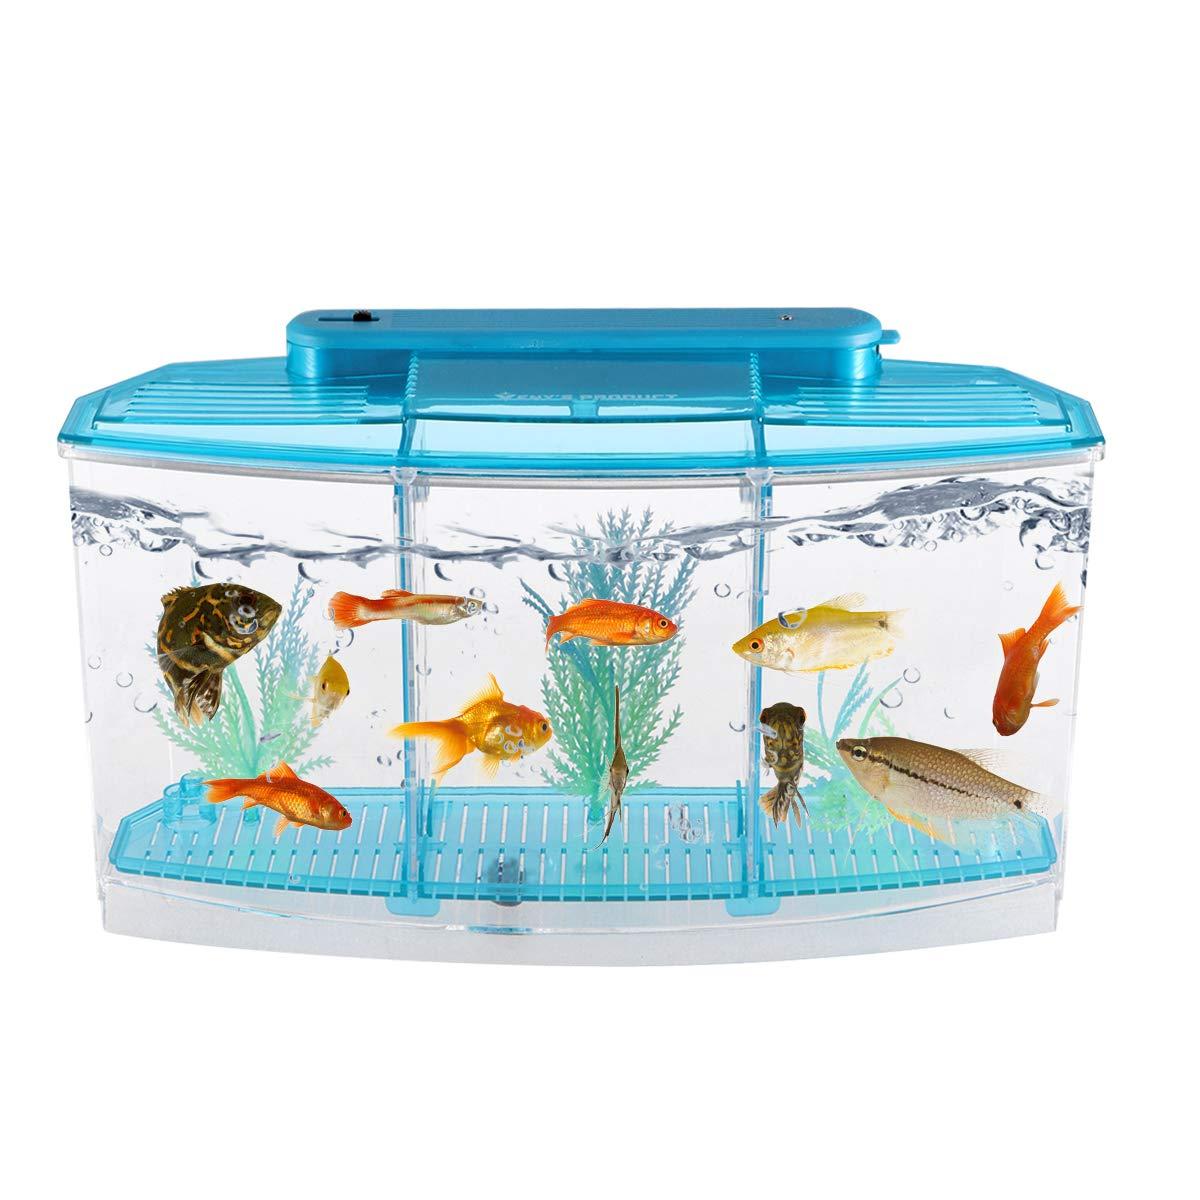 POPETPOP Mini Desktop Aquariums Fish Tank Ecological Goldfish Tank Hatchery Breeder Box for Living Office and Home dÃcor(Blue) by POPETPOP (Image #8)